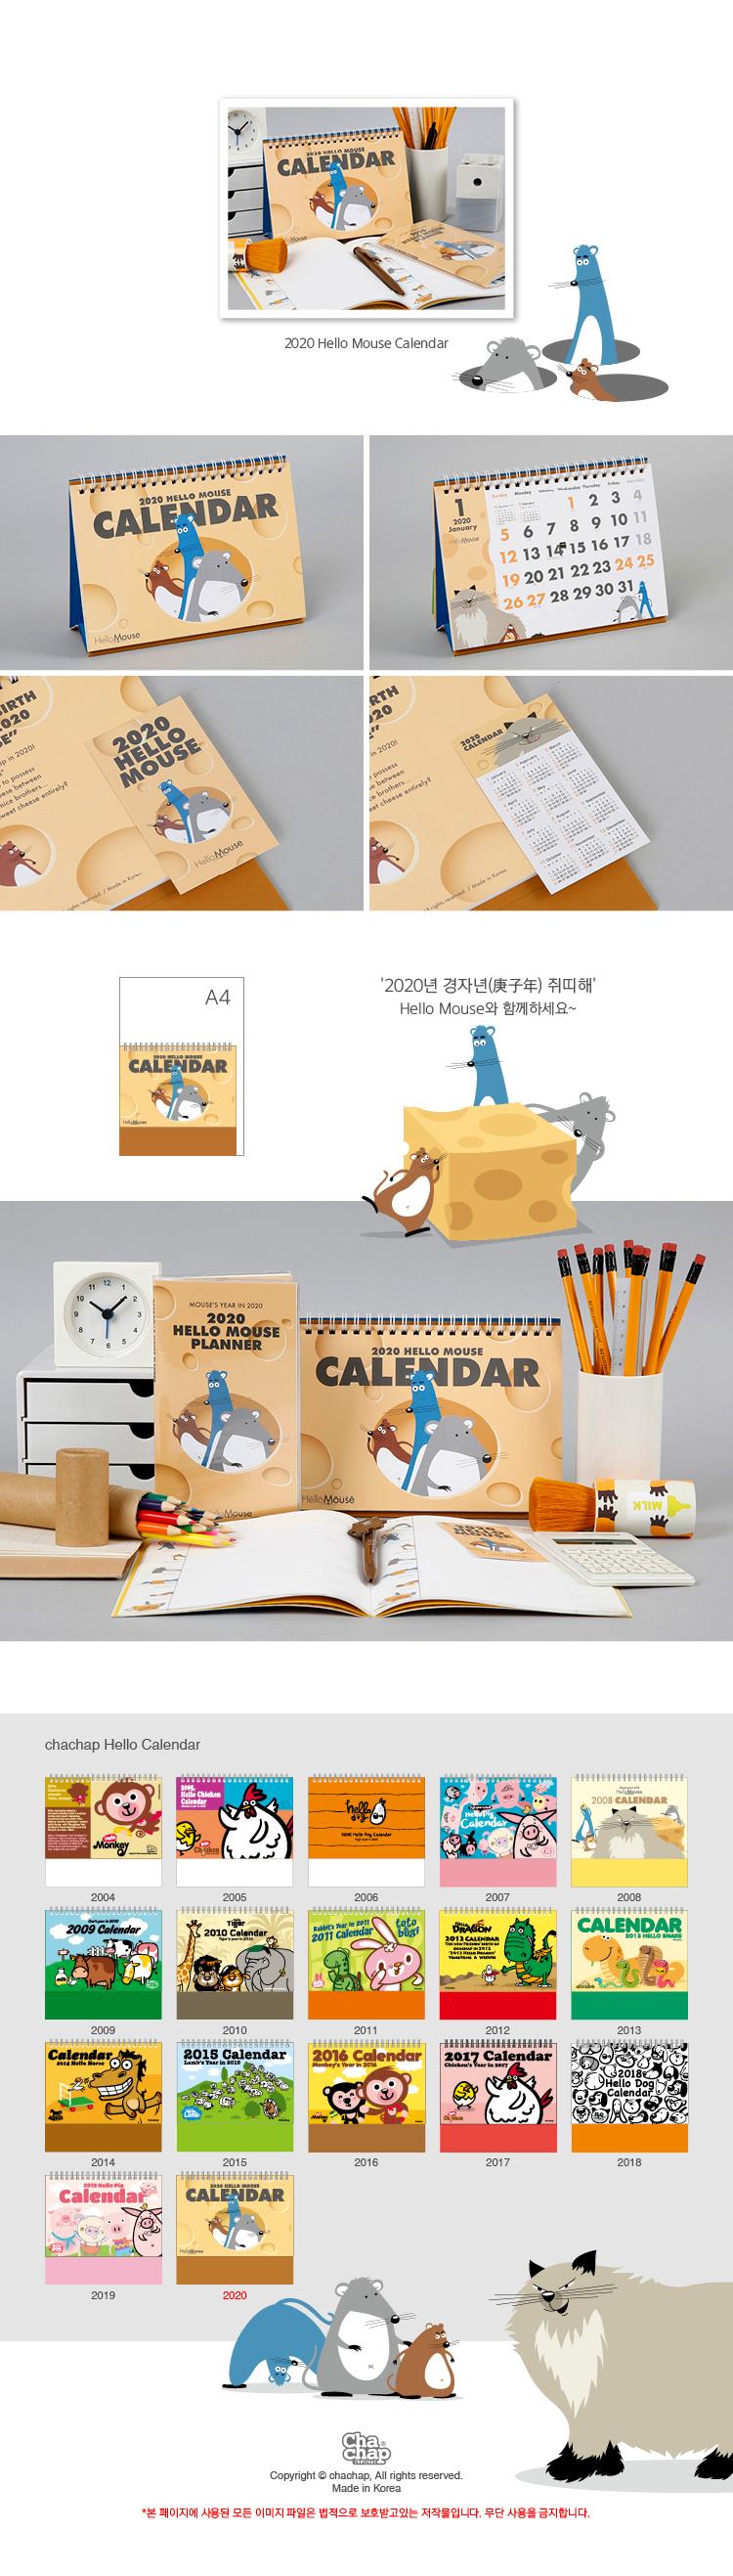 2020 Hello Mouse Calendar2,500원-캐찹디자인문구, 다이어리/캘린더, 캘린더, 2020 탁상용달력바보사랑2020 Hello Mouse Calendar2,500원-캐찹디자인문구, 다이어리/캘린더, 캘린더, 2020 탁상용달력바보사랑